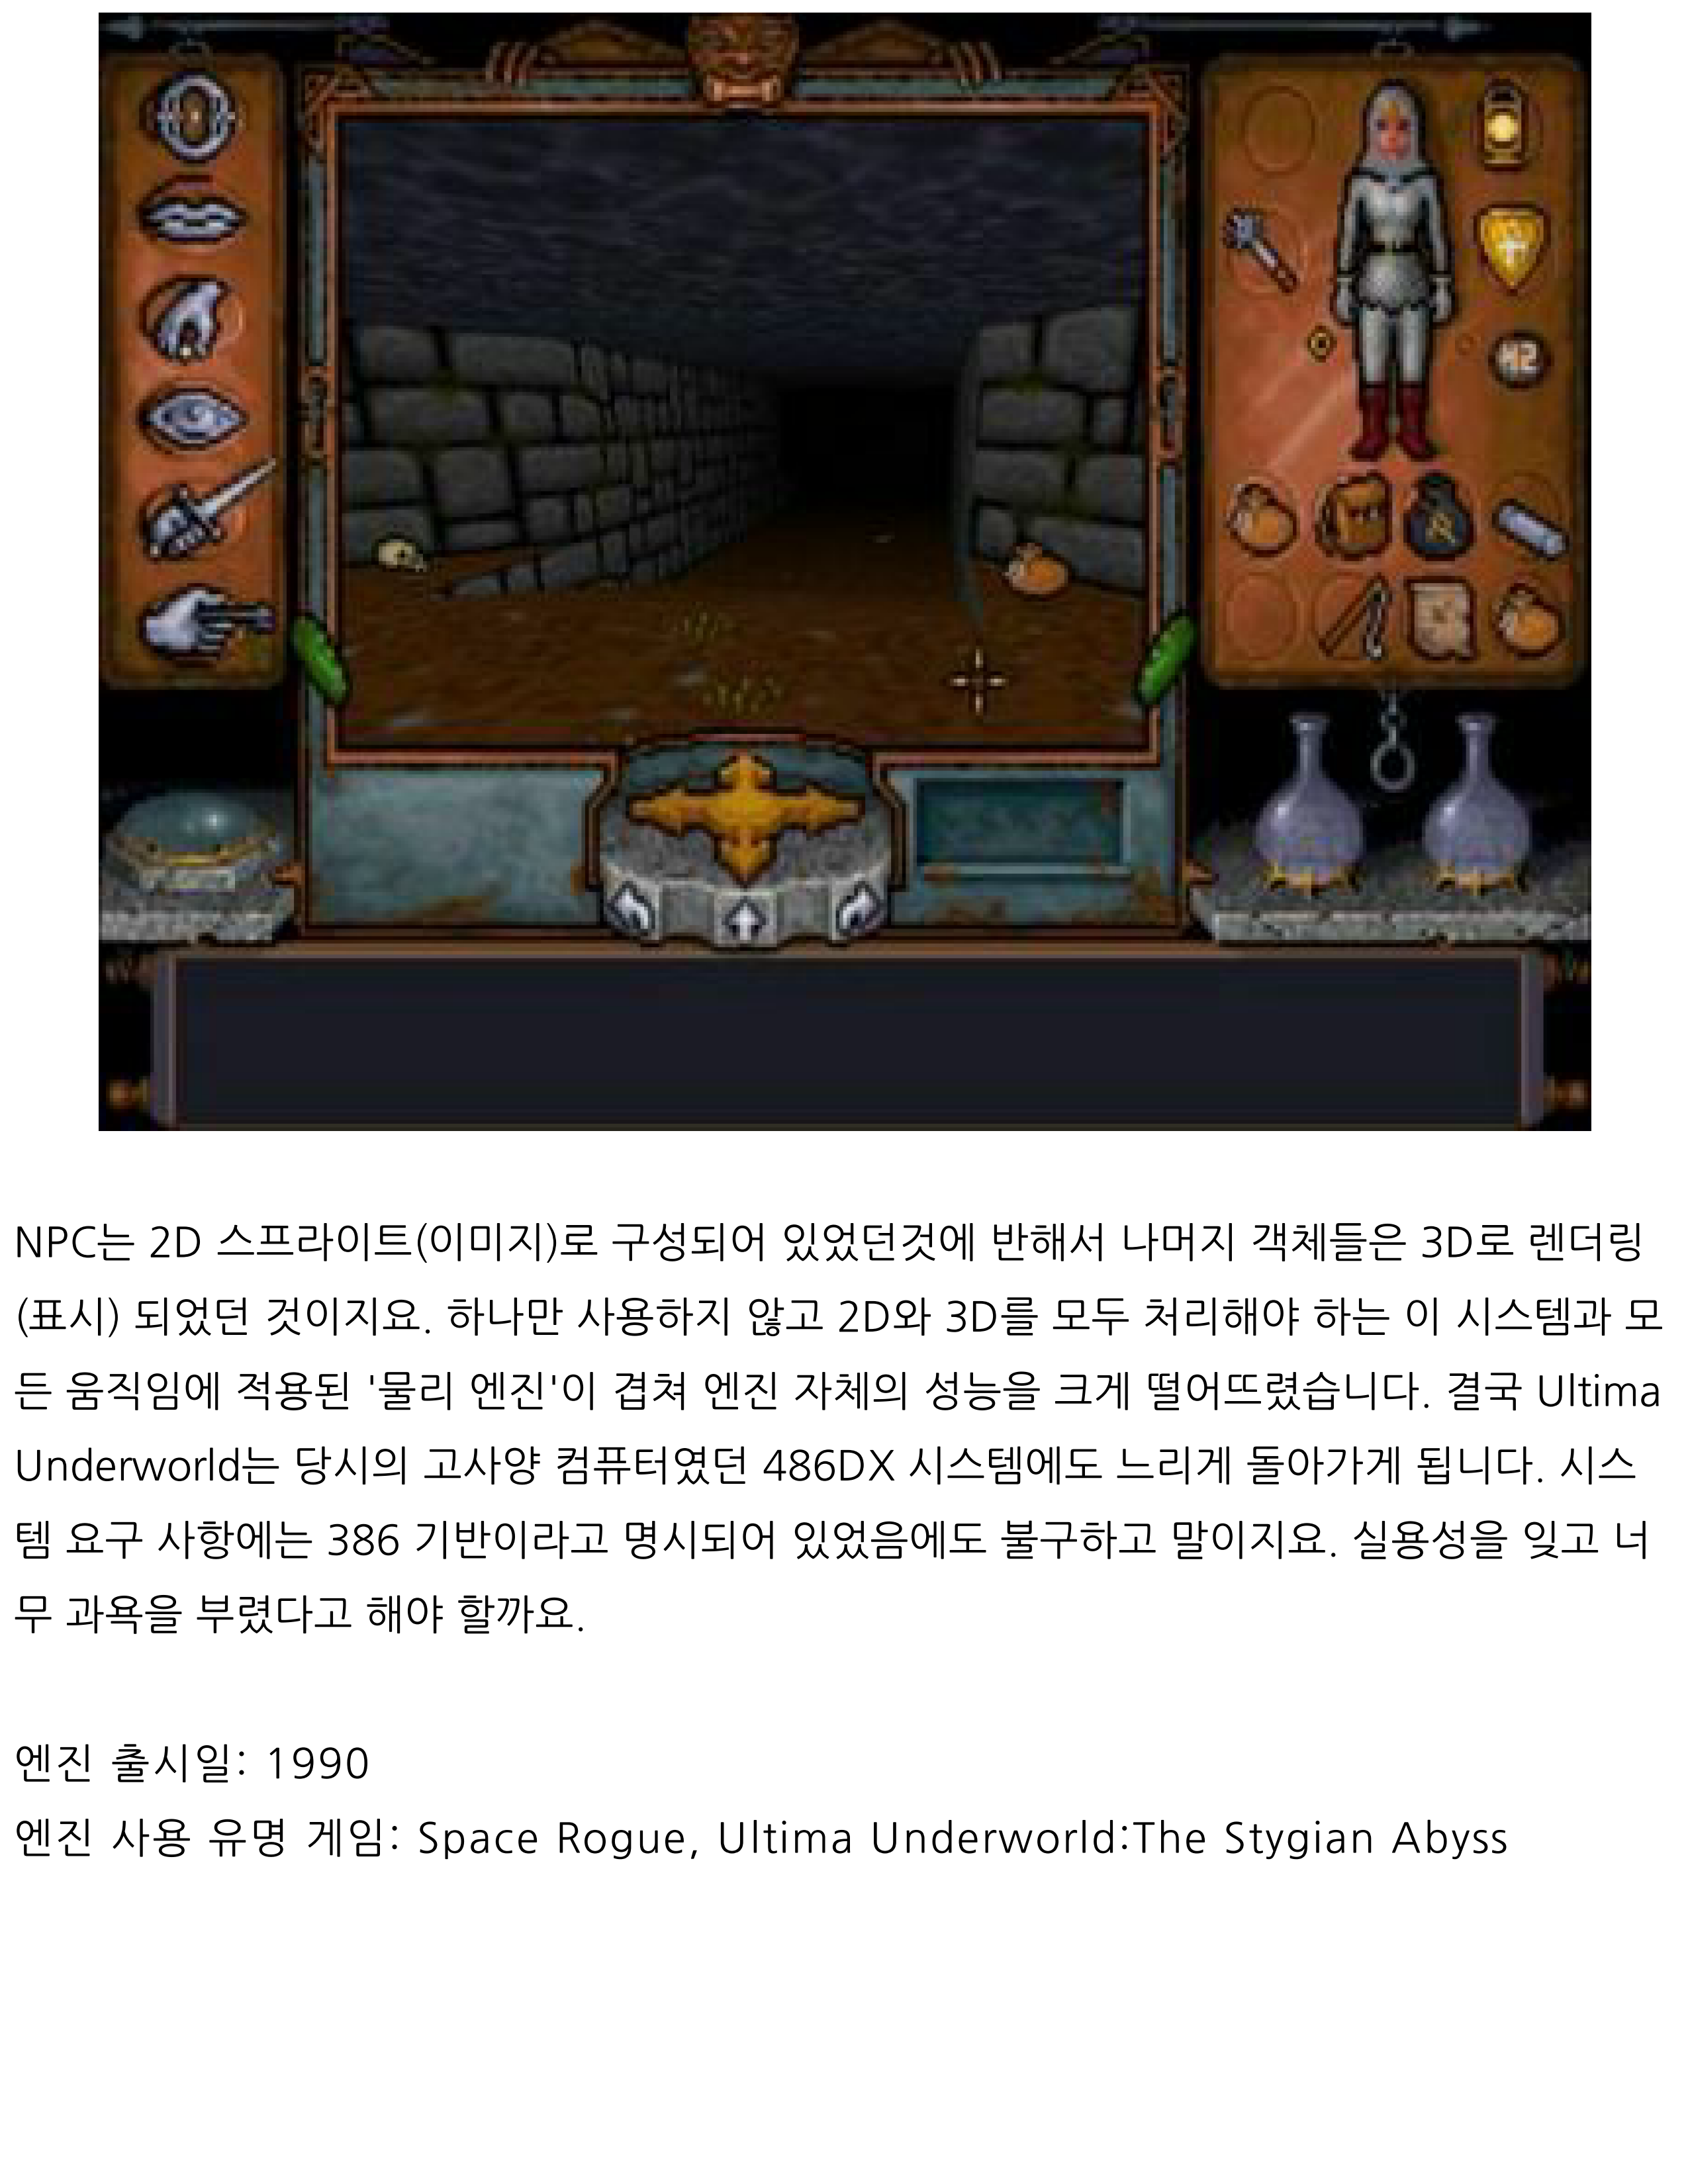 3D geim enjin, eoddeohge baljeo - jeonhyeonseog_10